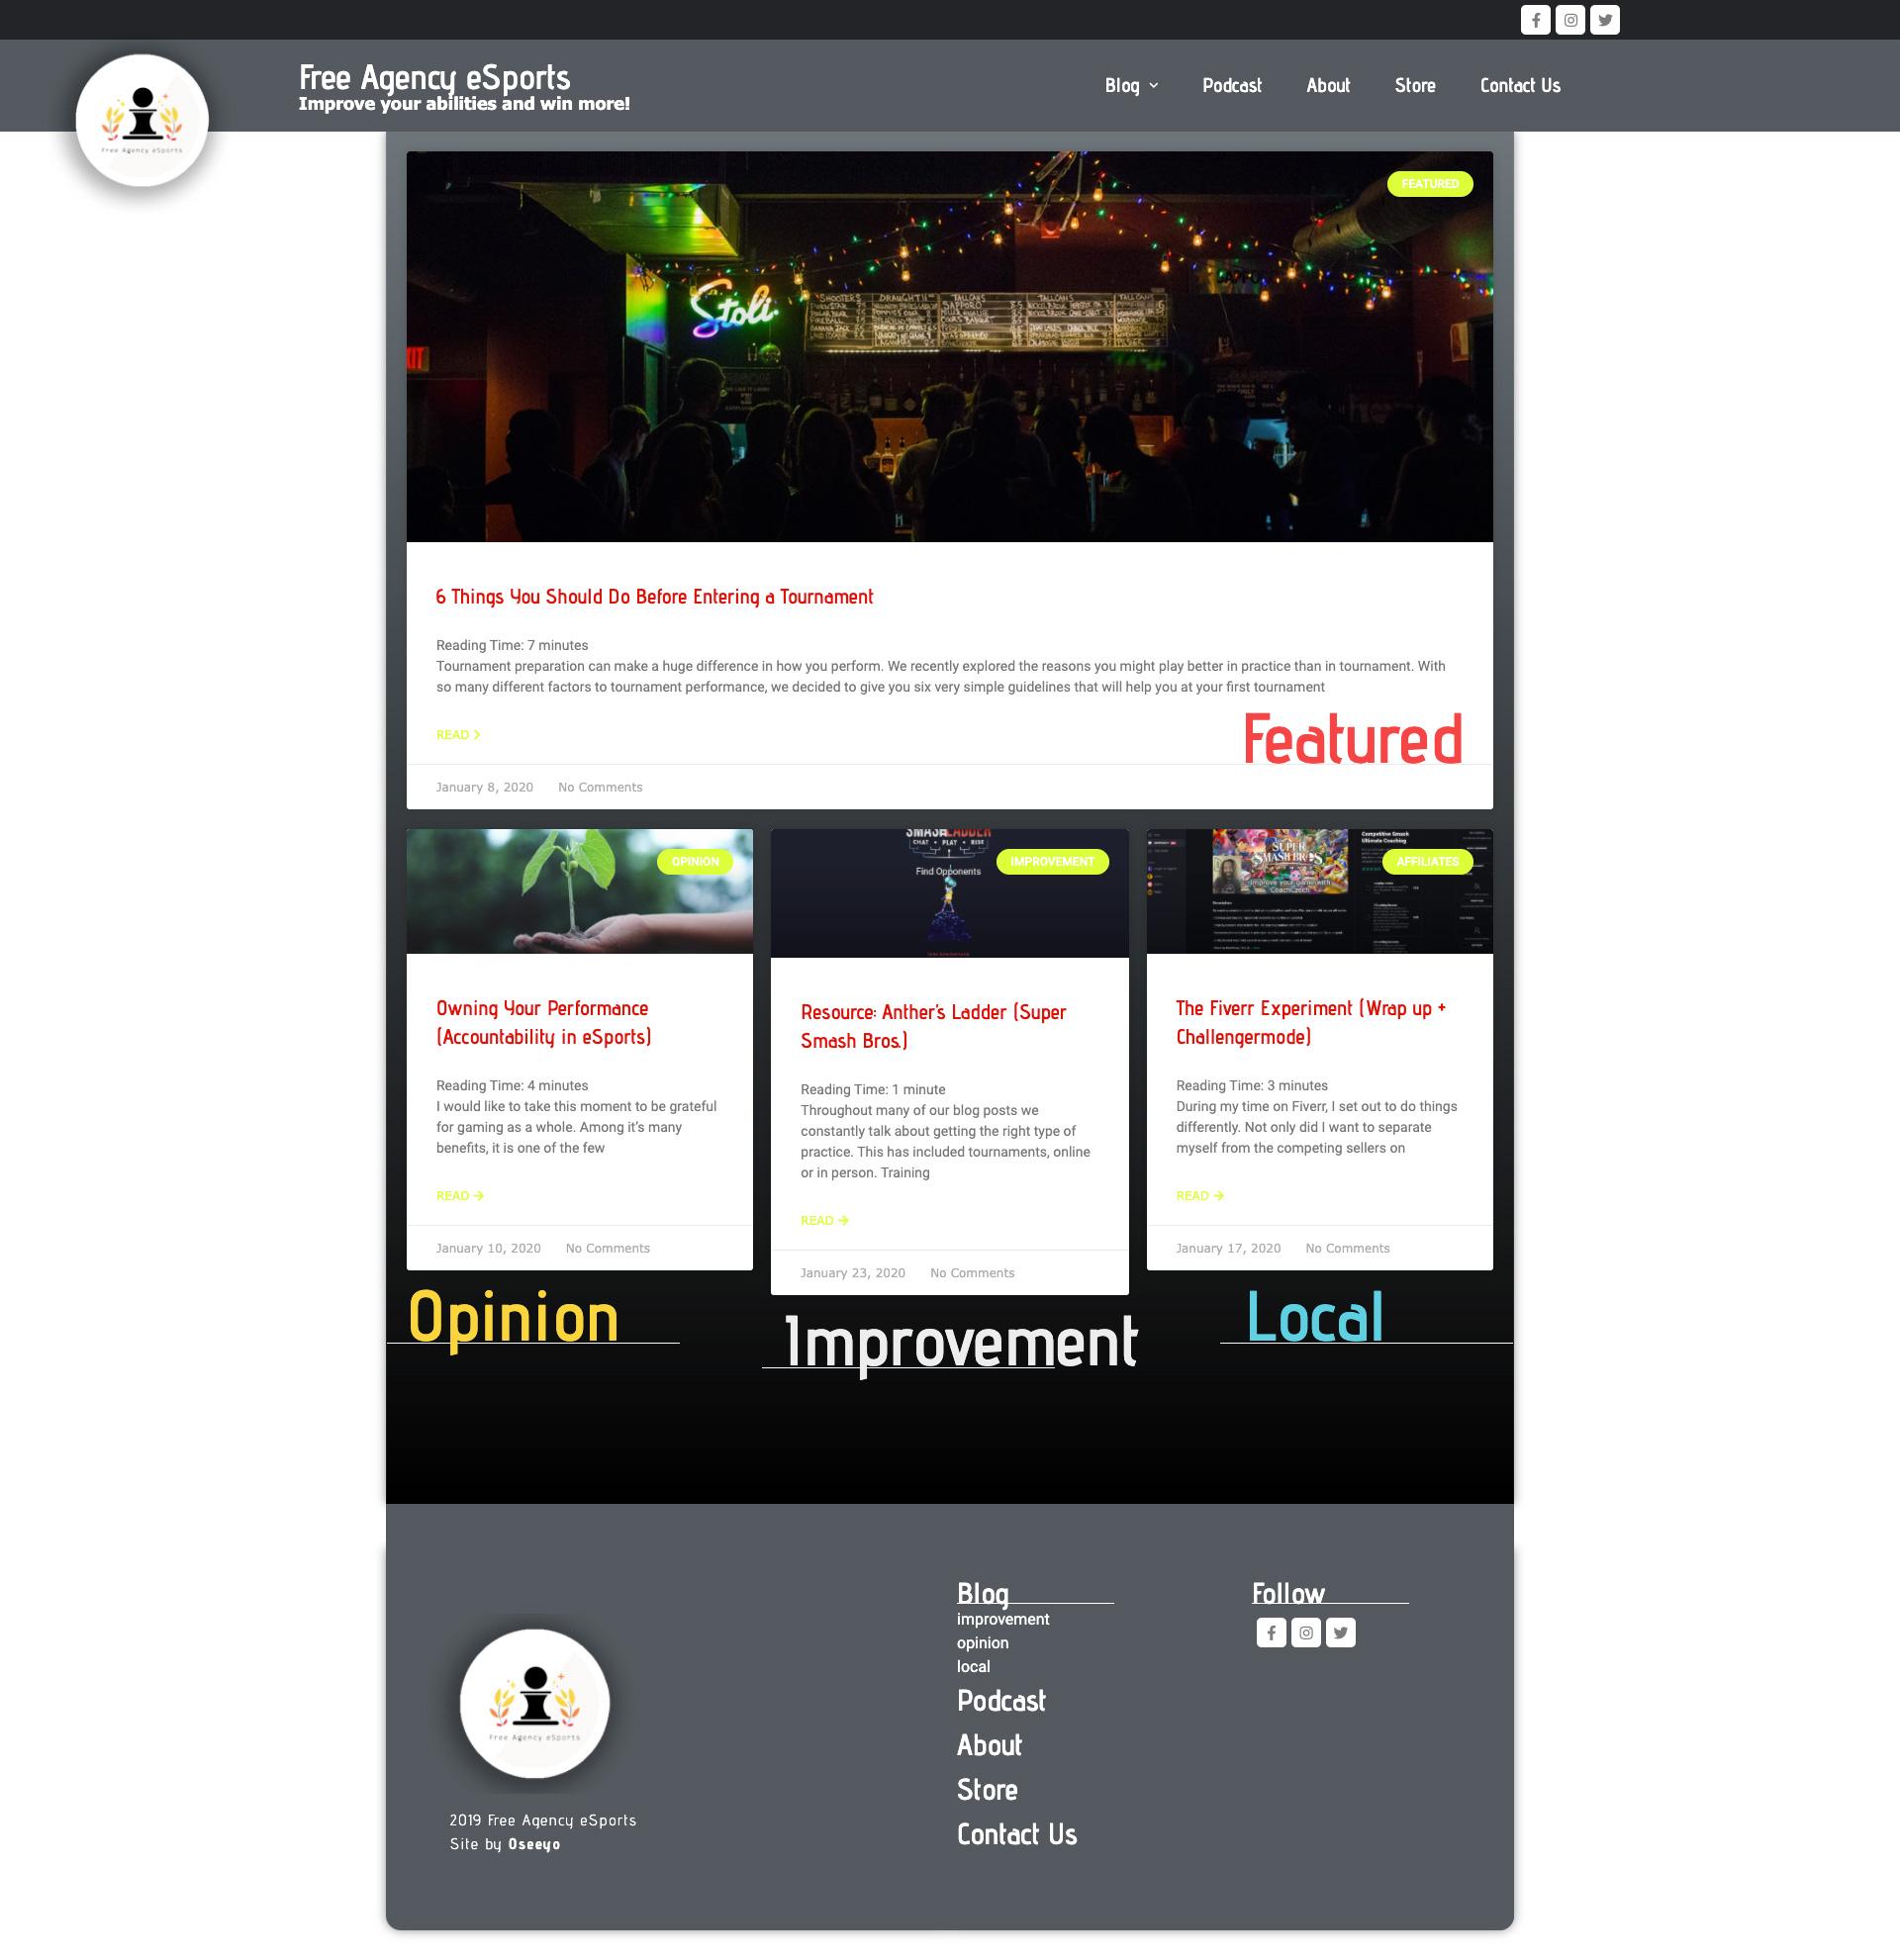 Oseeyo Web Development and Design - Free Agency eSports - news agency website - Vero Beach, FL